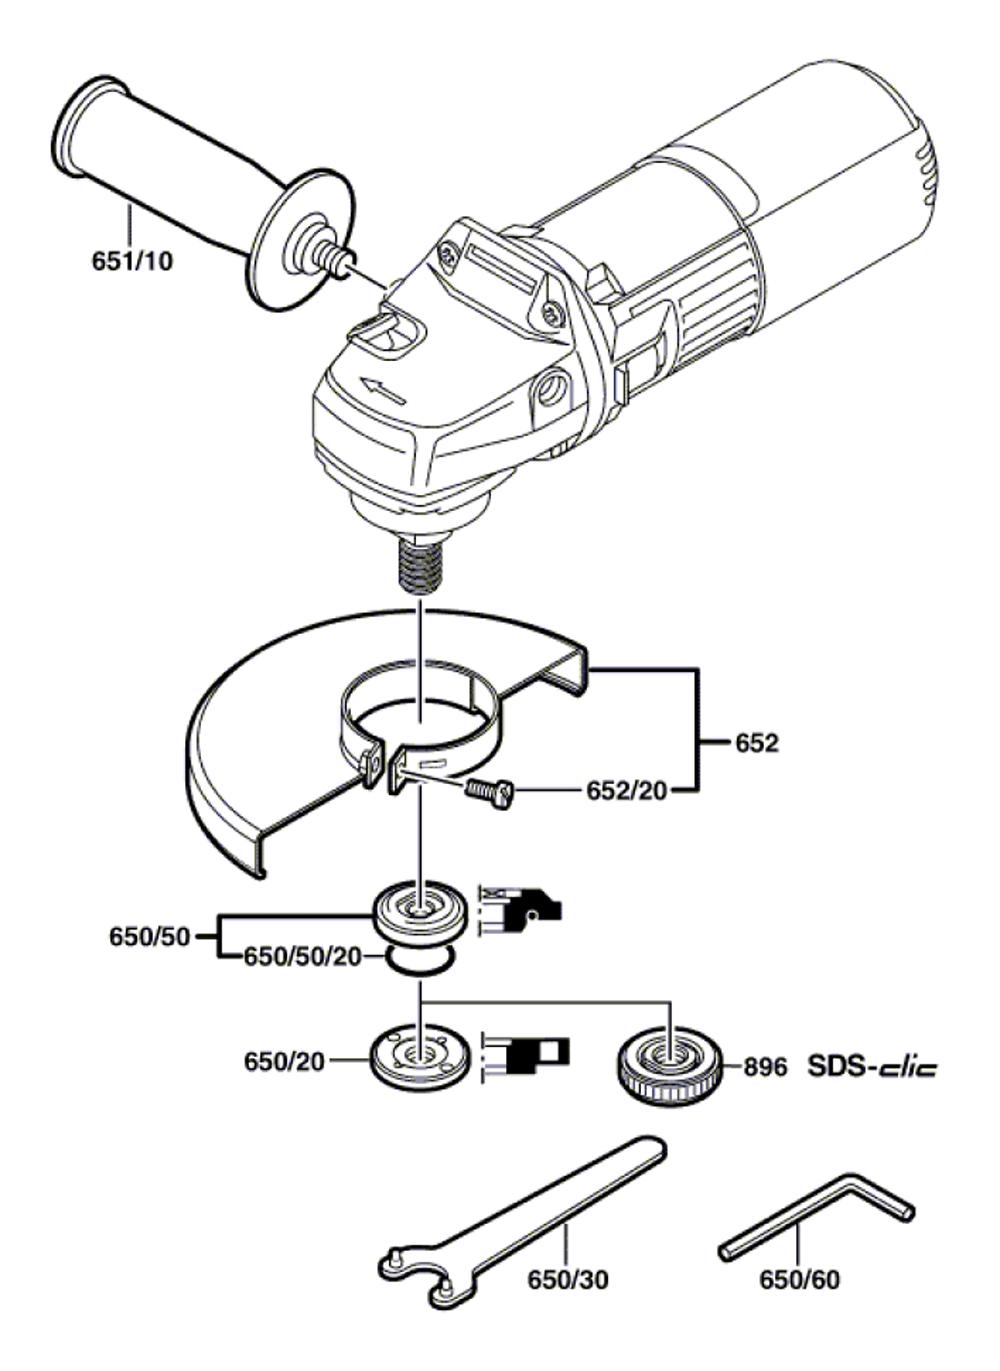 GWS9-125CE-(0601344739)-Bosch-PB-1Break Down